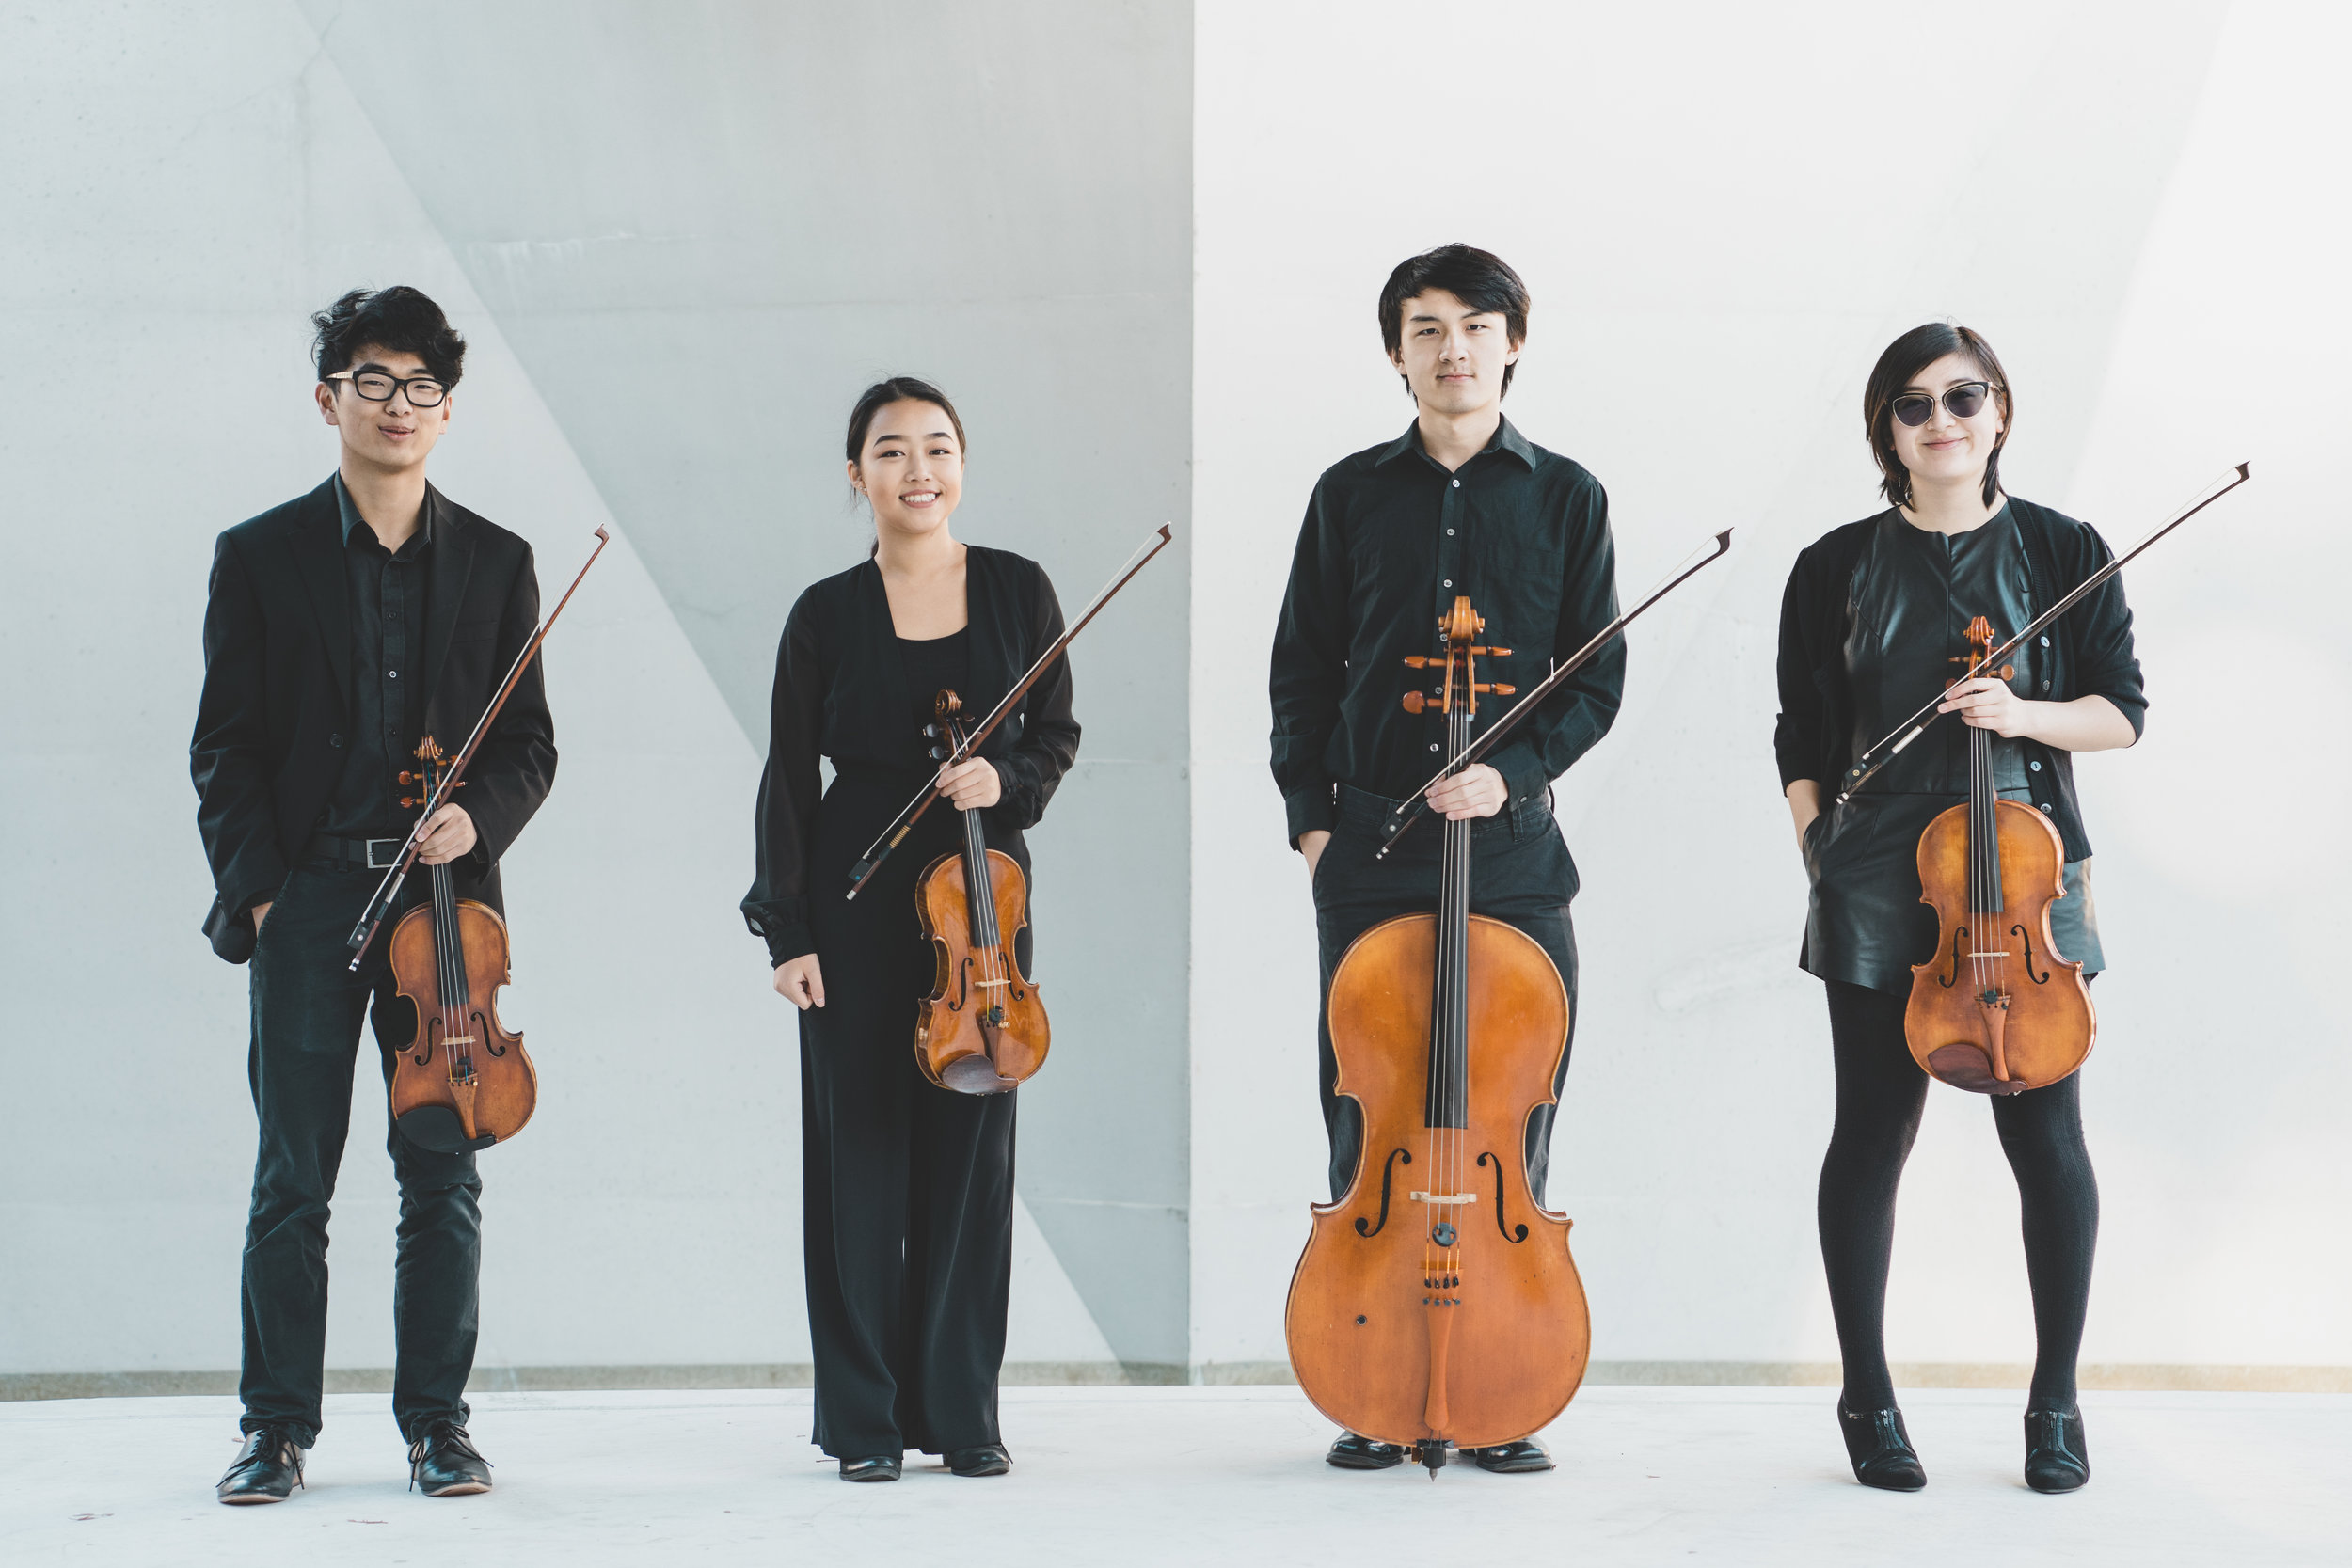 L to R: Kurt Chen, Yiyi Hsu, Adrian Pang, Amanda Pang